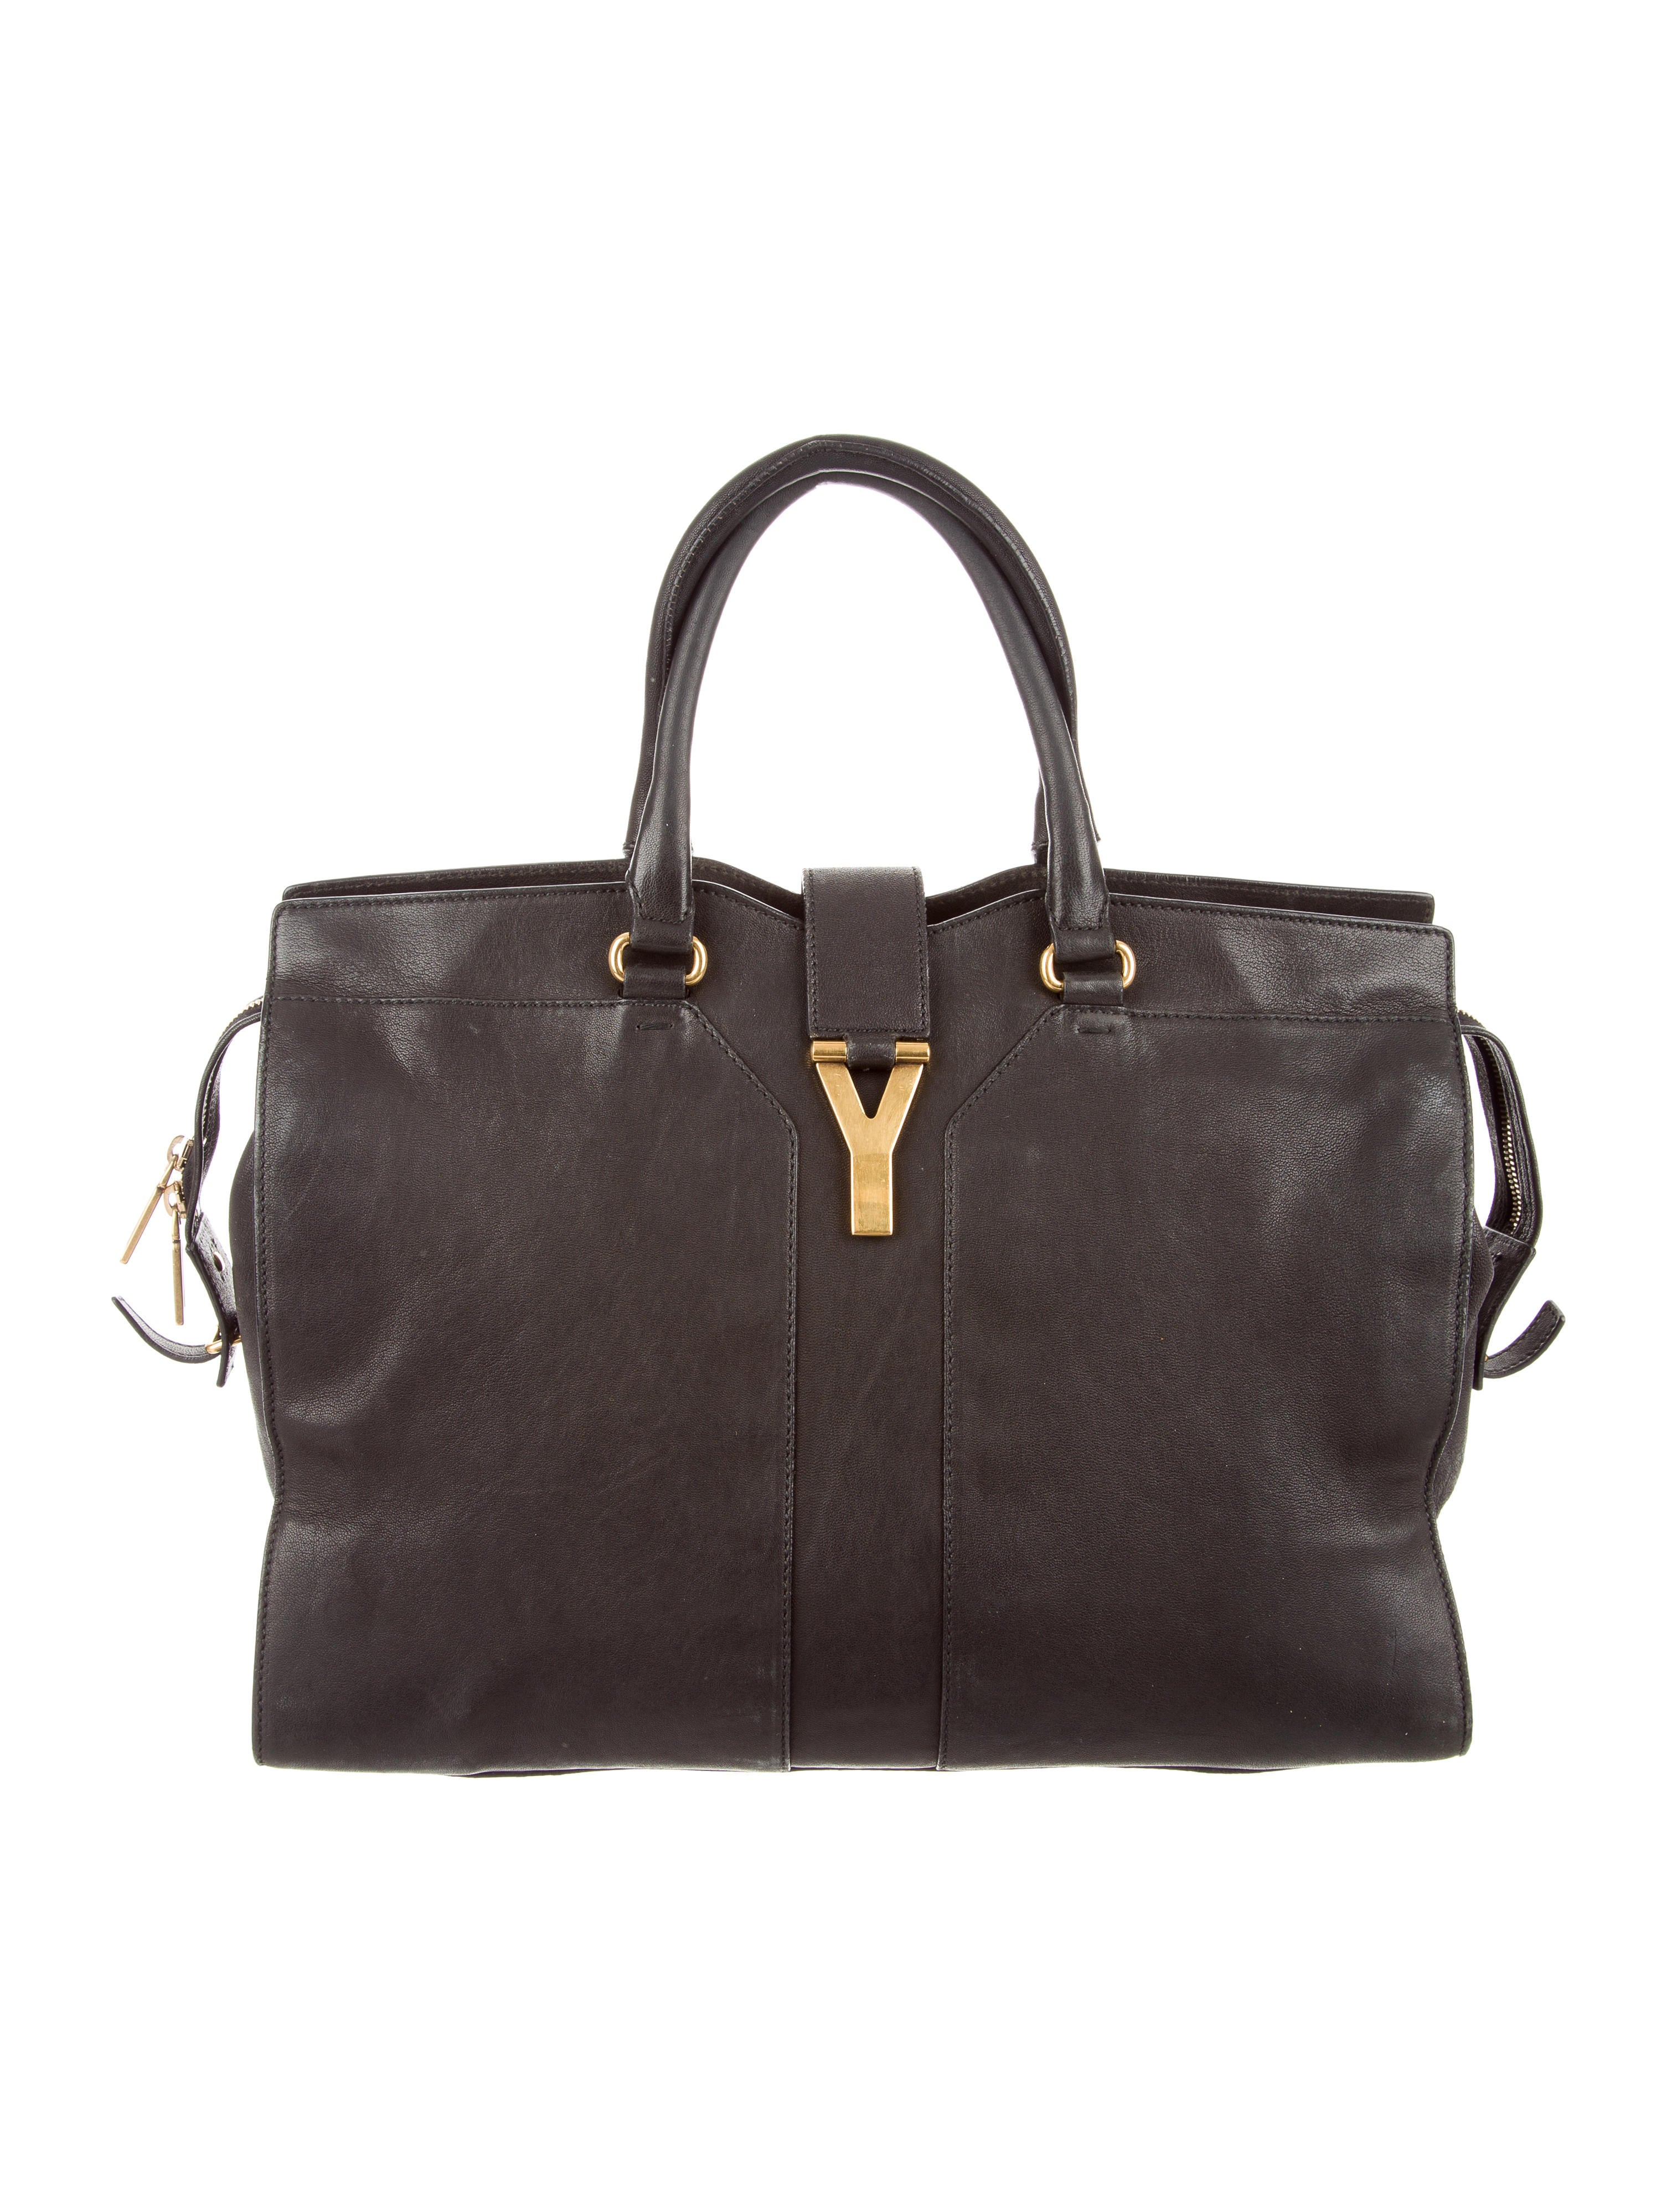 Yves Saint Laurent Cabas Chyc Bag - Handbags